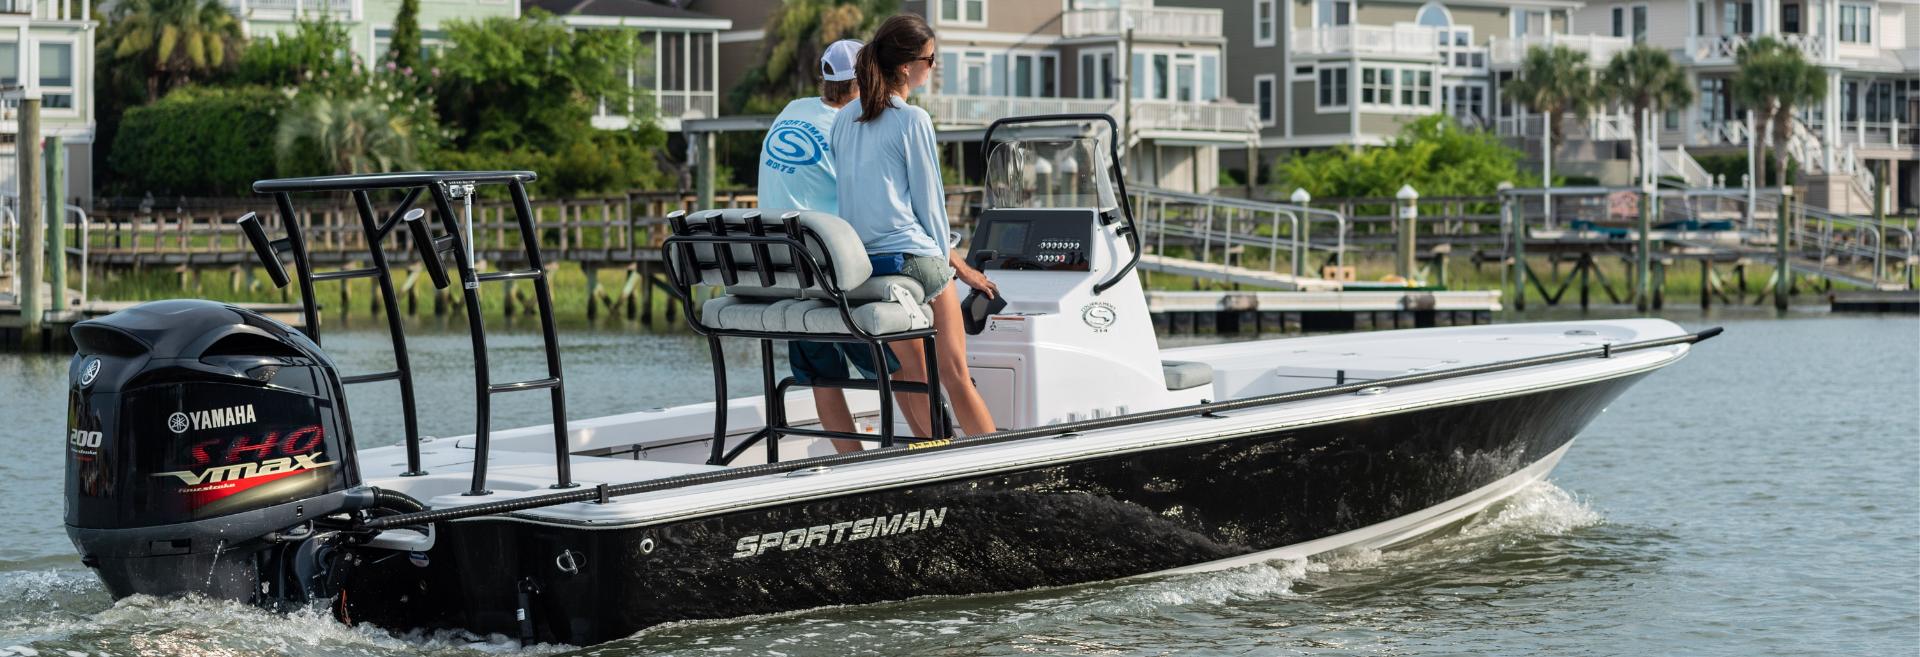 Sportman boat action shot